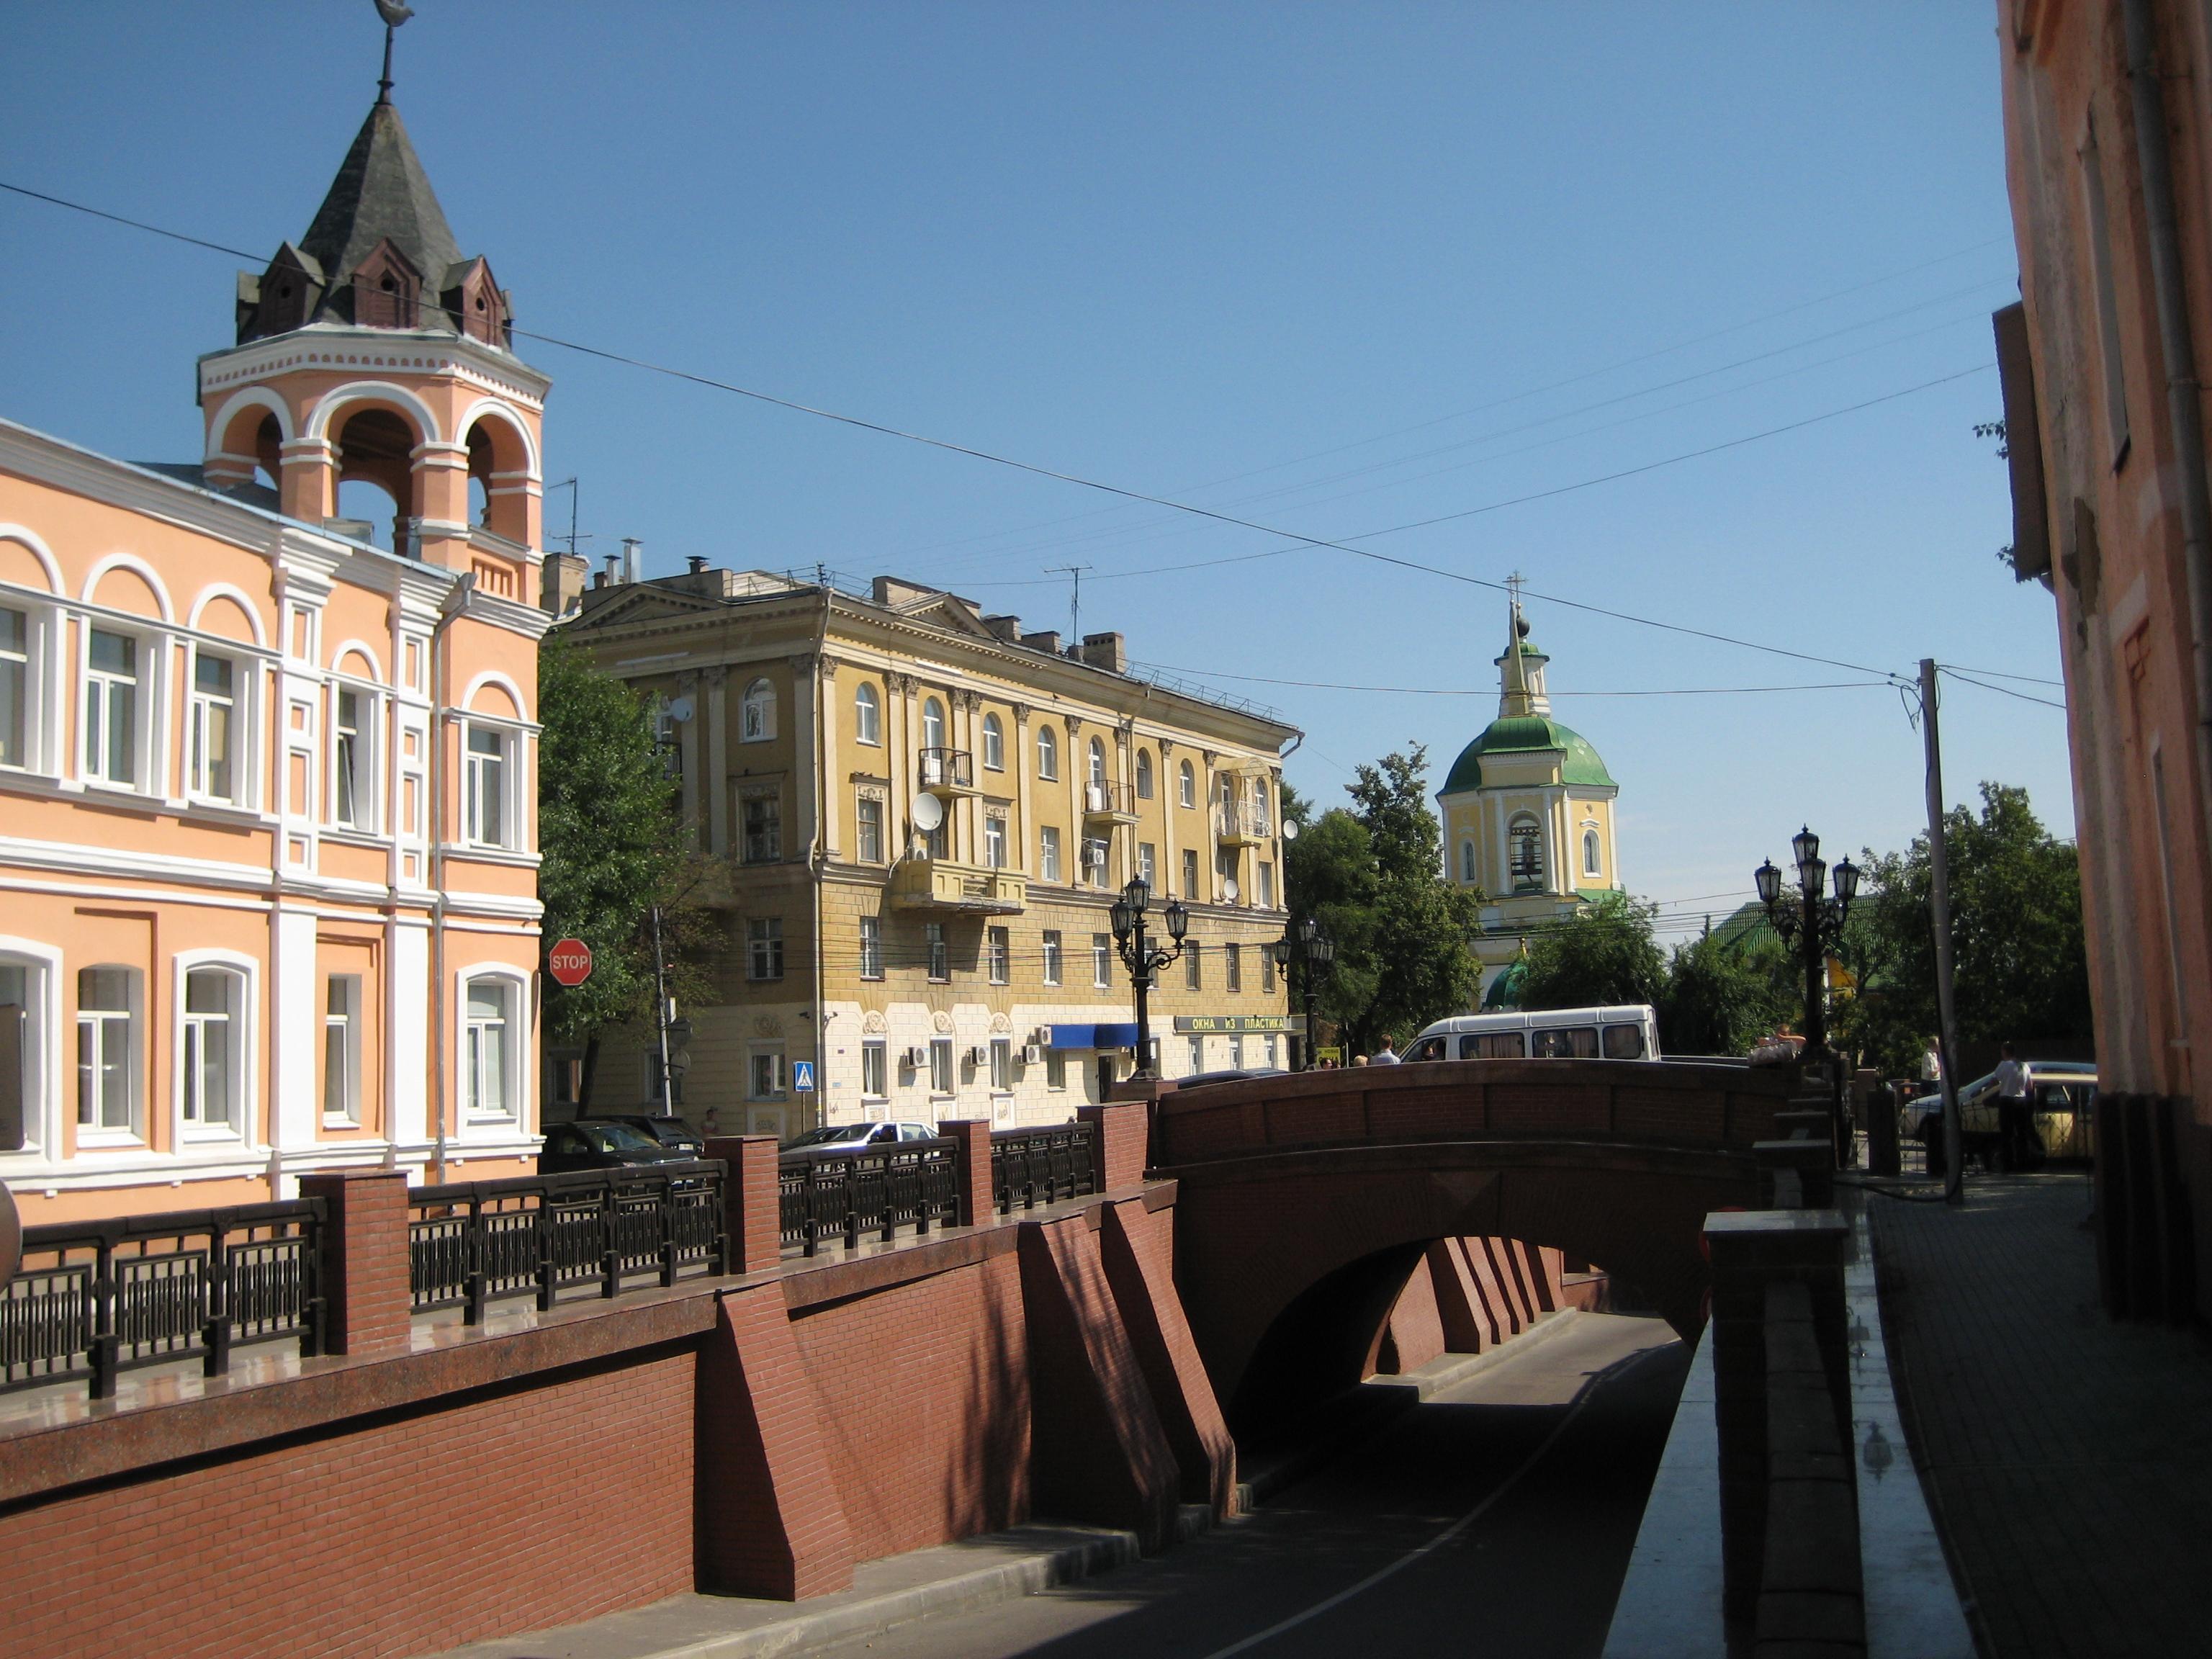 Voronezh Russia  city pictures gallery : Voronezh. Russia. stone Bridge. Воронеж. Каменный ...